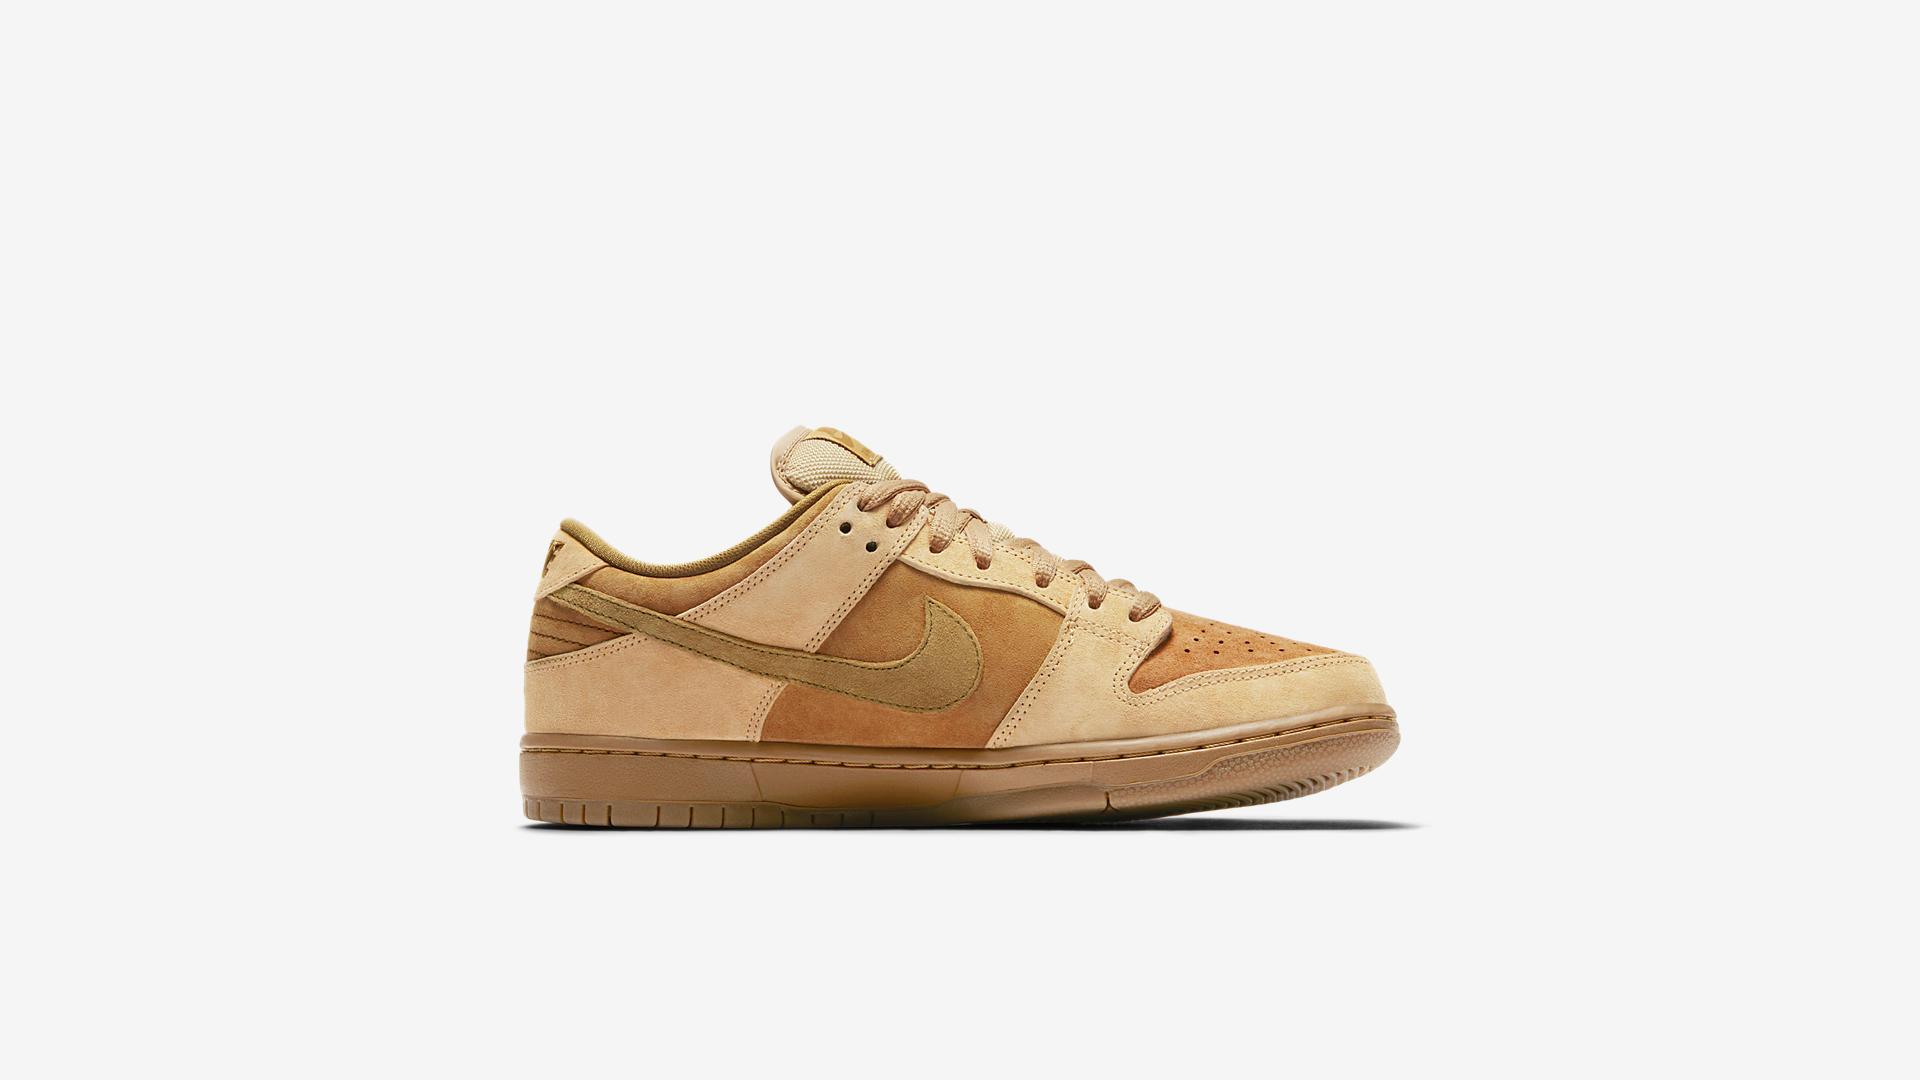 Nike SB Dunk Low Pro Wheat 883232 700 3